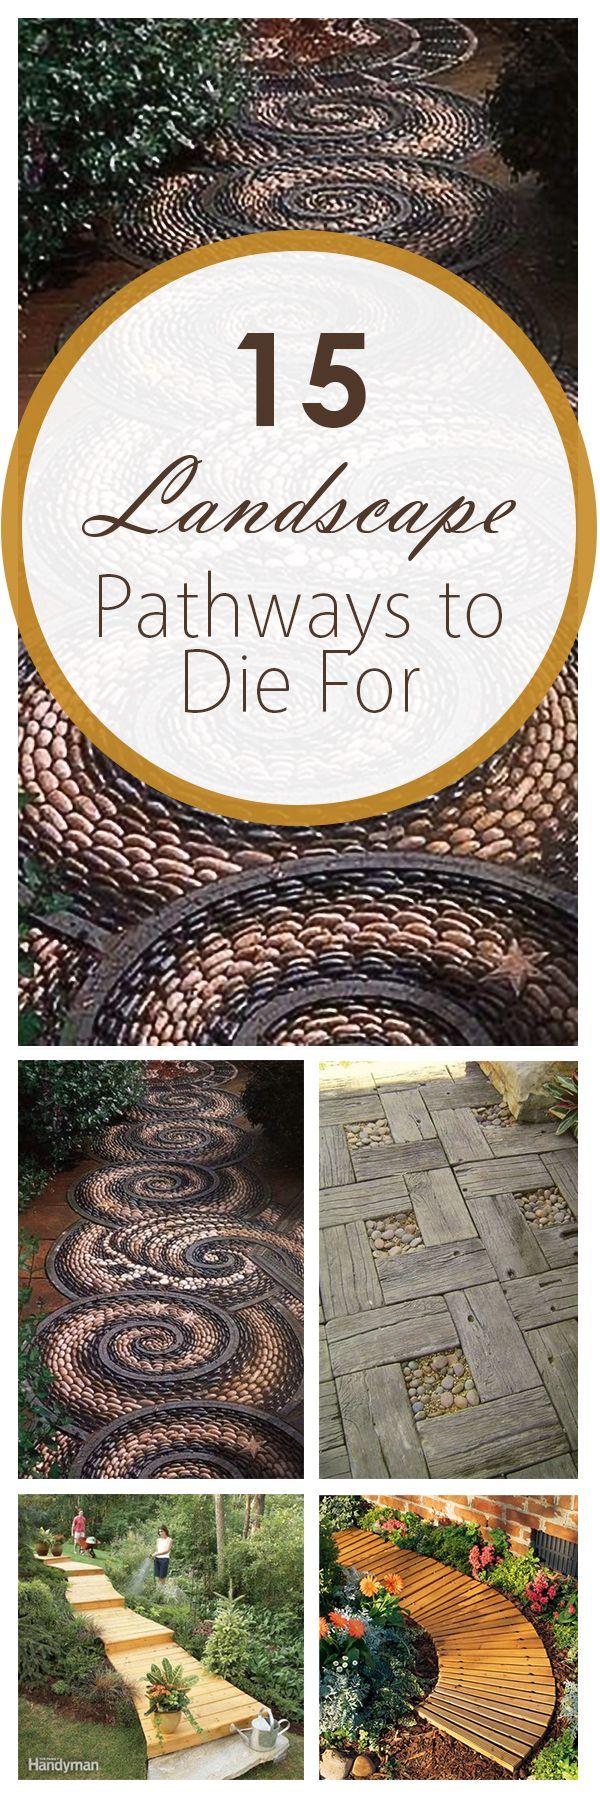 15 Landscape Pathways to Die For (1)